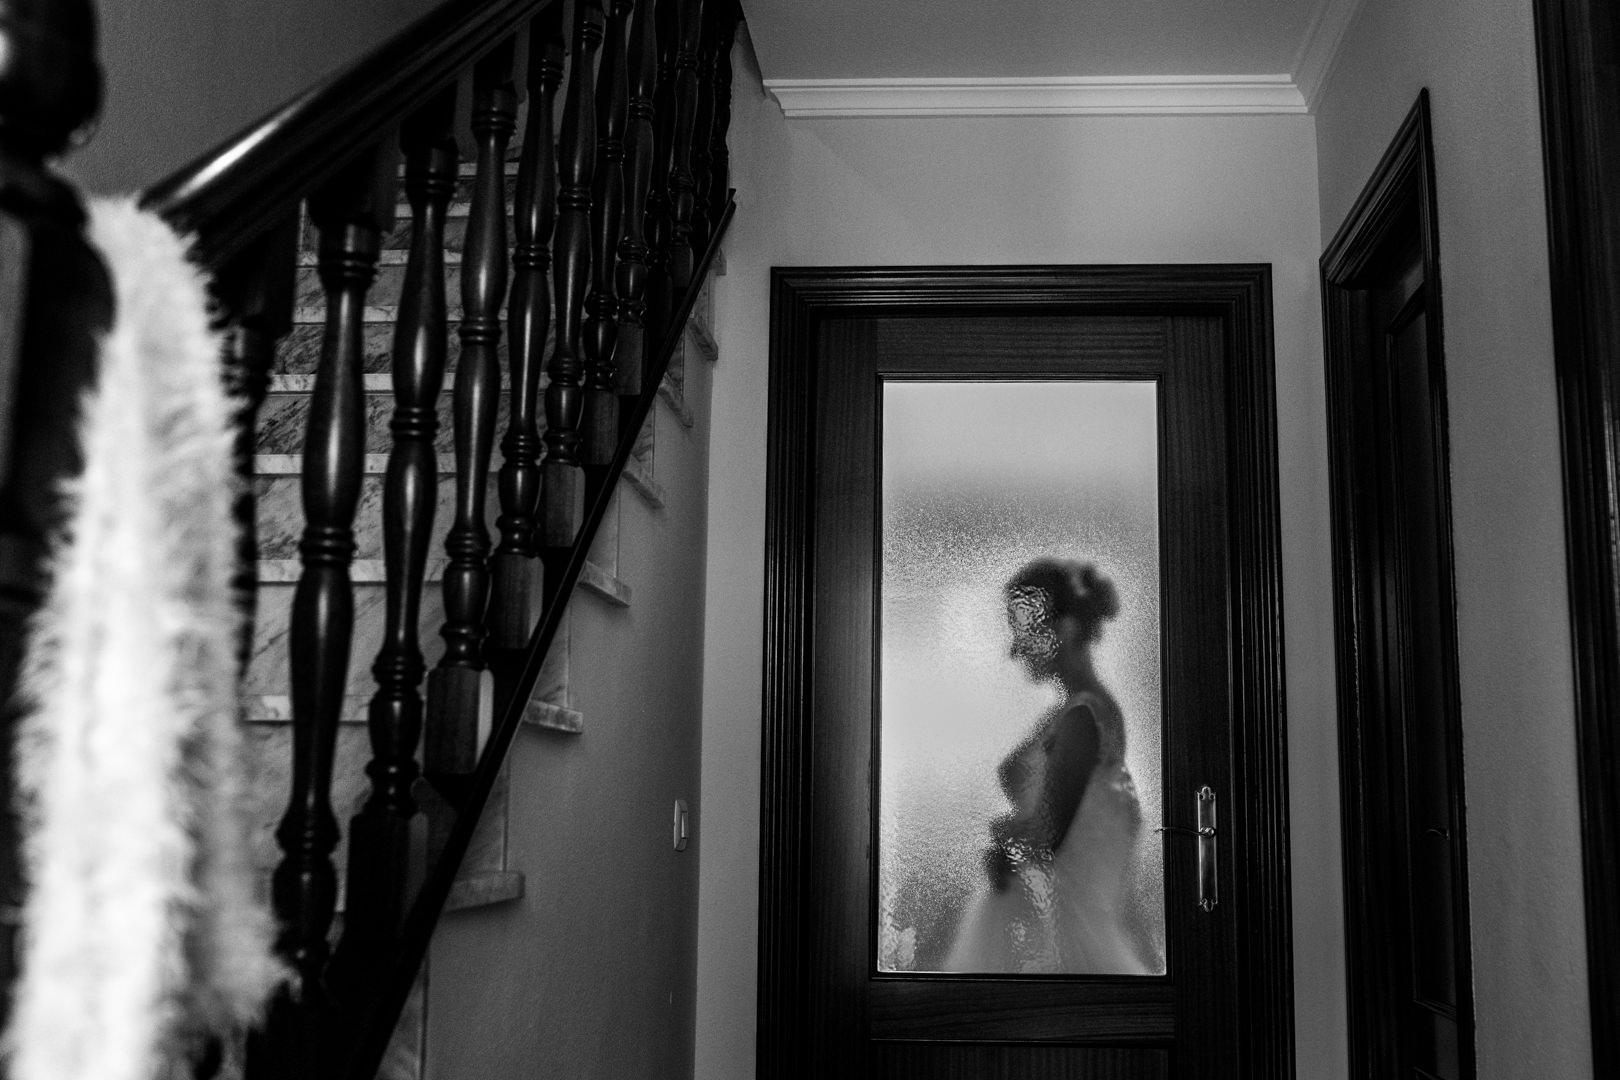 Boda-Hacienda-LOrigen-Pepe-Maria-engagement-Rafael-Torres-fotografo-bodas-sevilla-madrid-barcelona-wedding-photographer--8.jpg